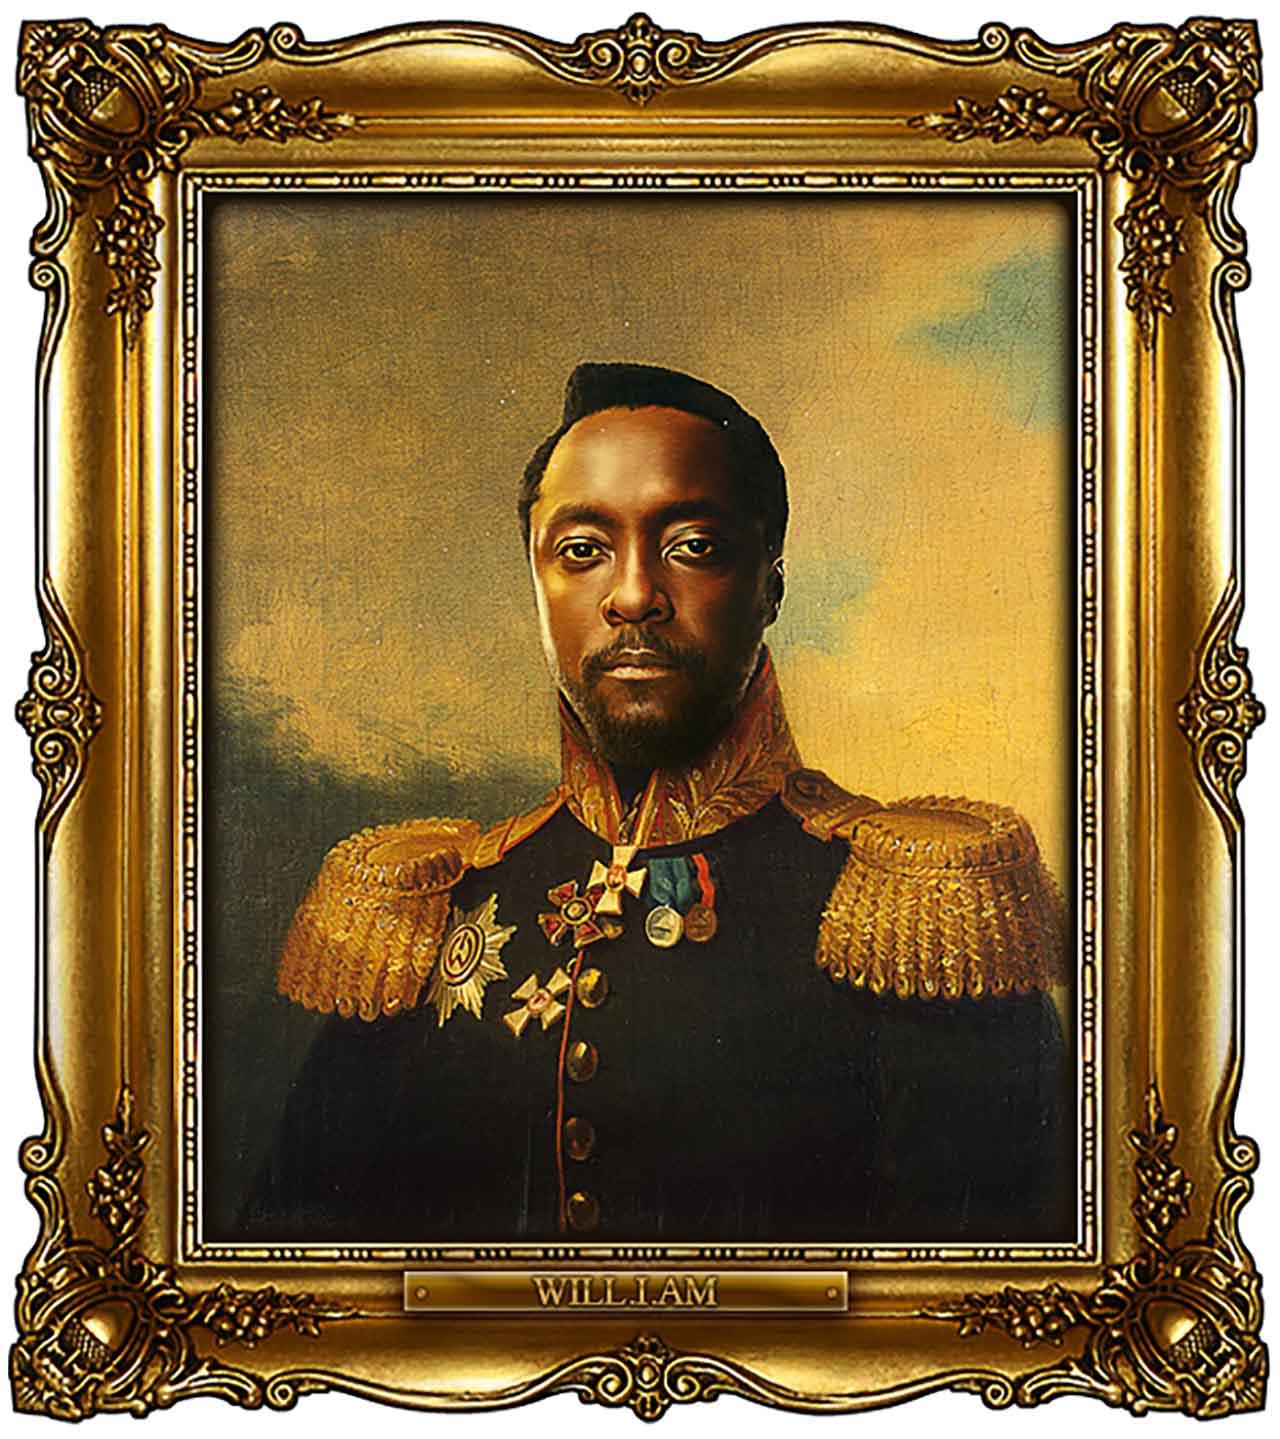 Artist Turns Famous Actors Into Russian Generals - William James Adams